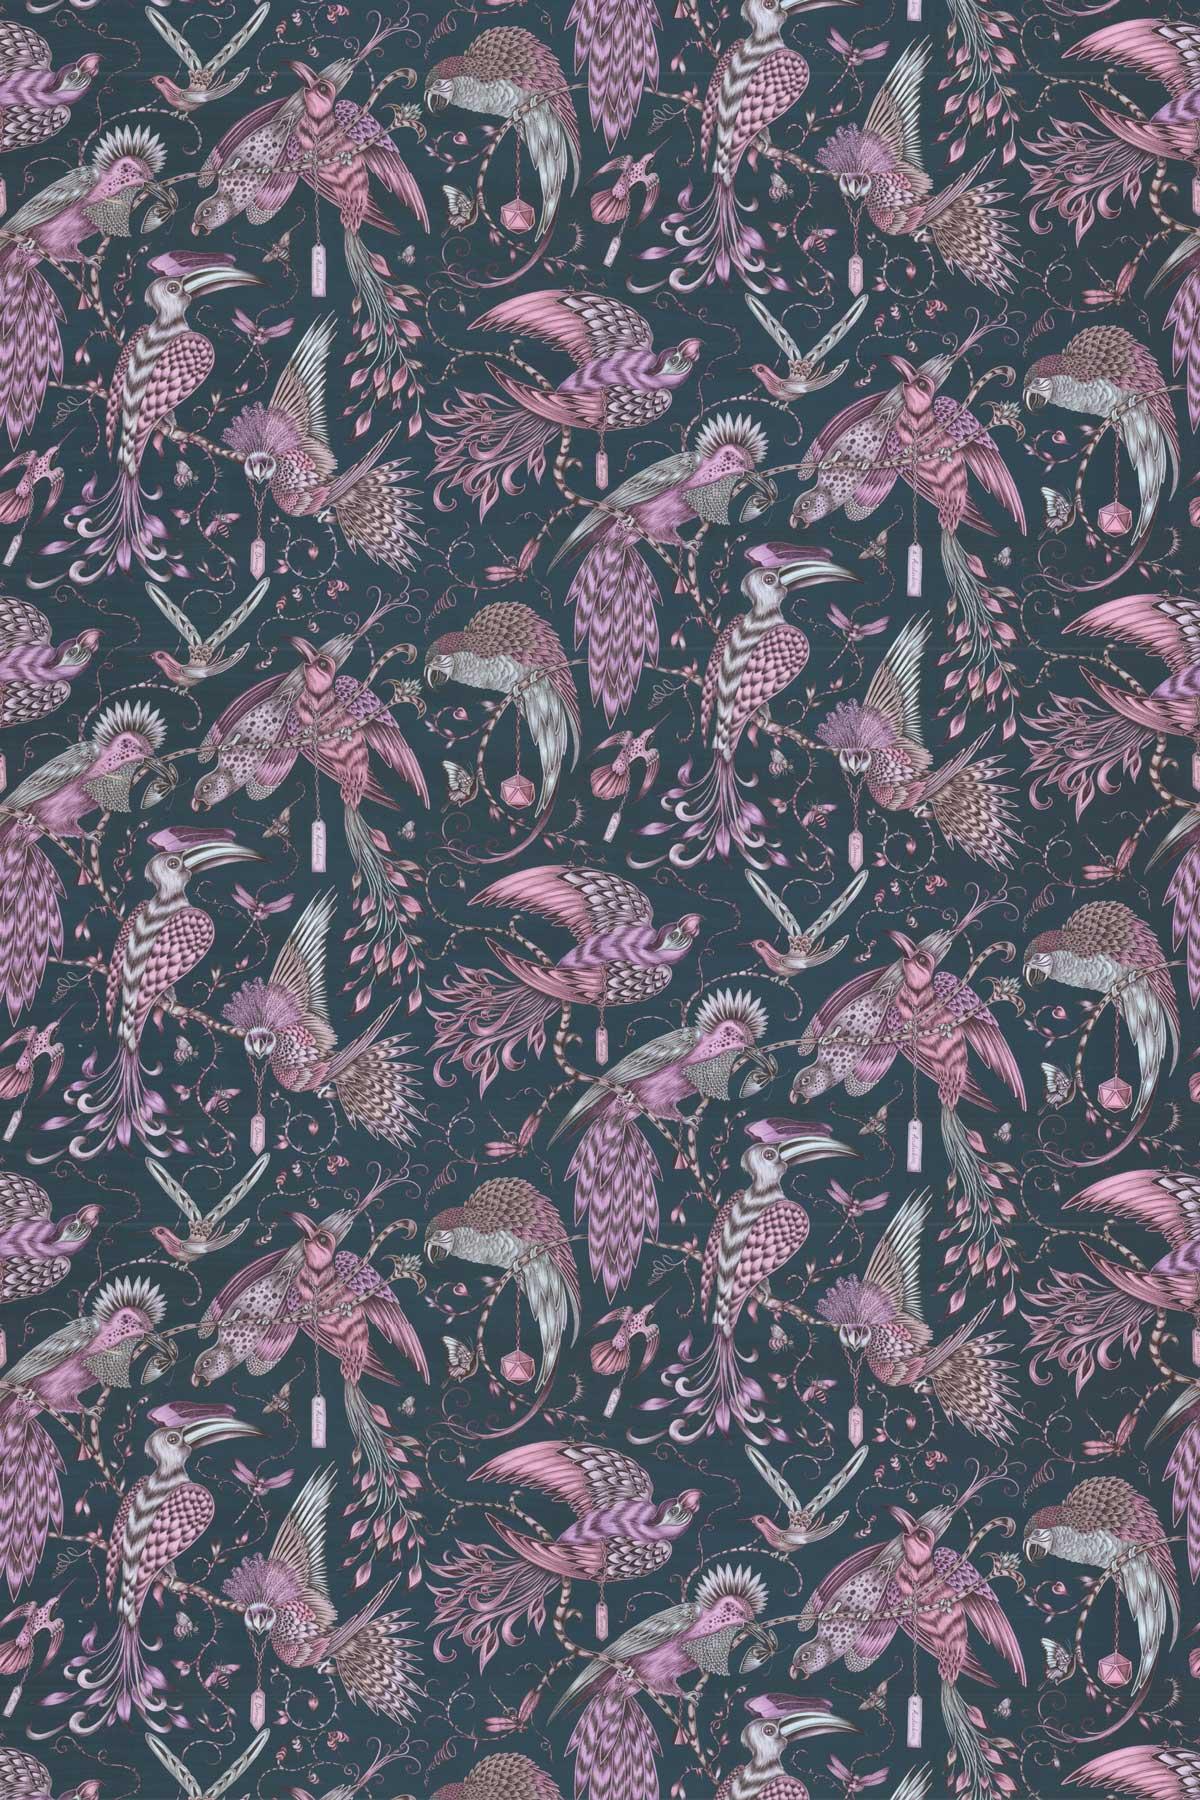 Emma J Shipley Audubon Velvet Pink Fabric - Product code: F1207/01